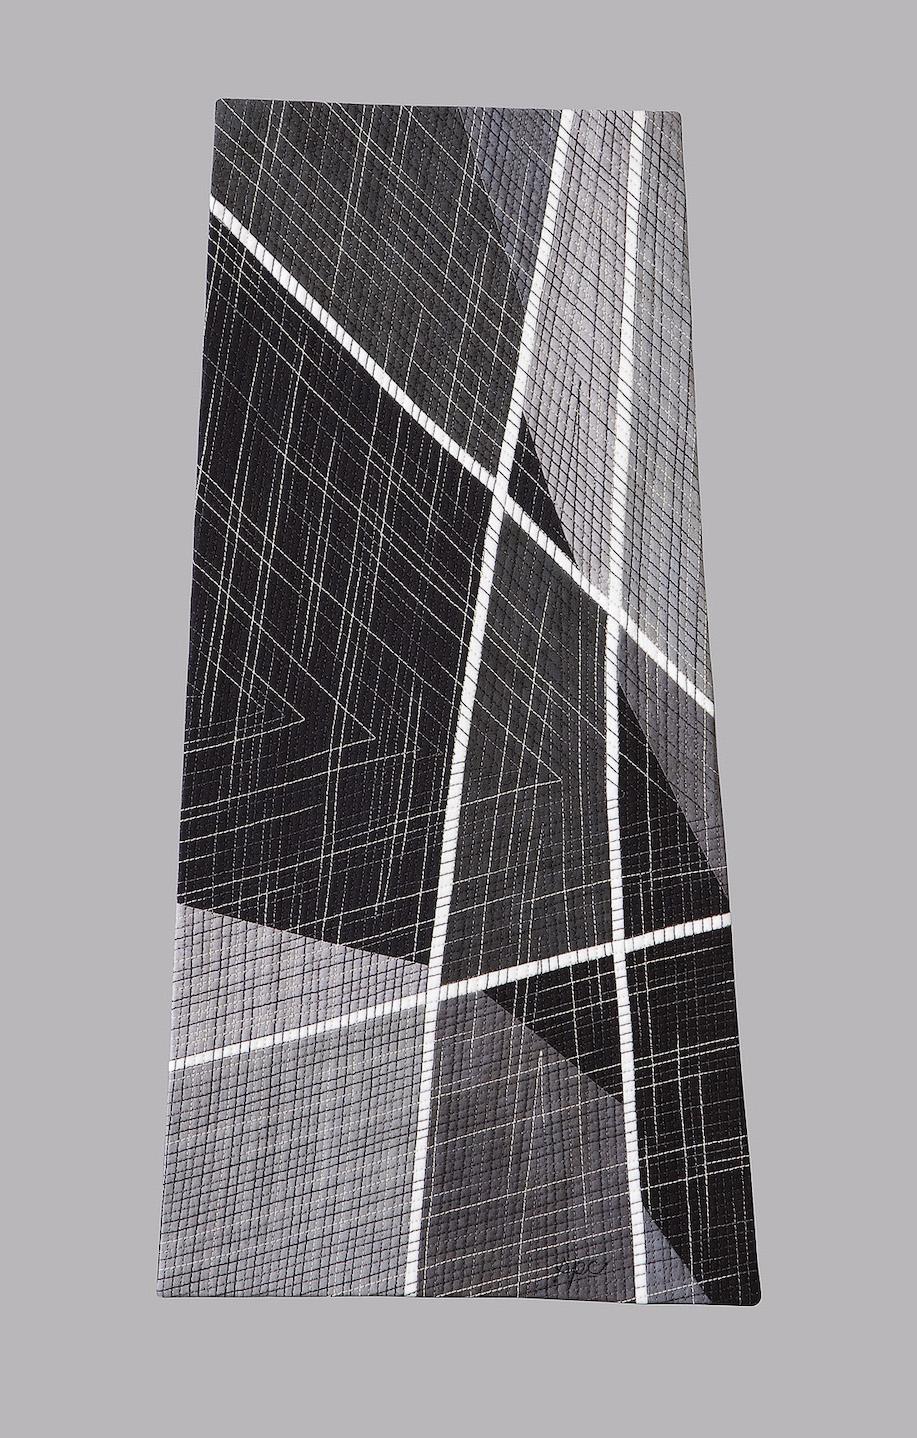 Figure/Ground Study #2 | © 2011 | 20 x 10